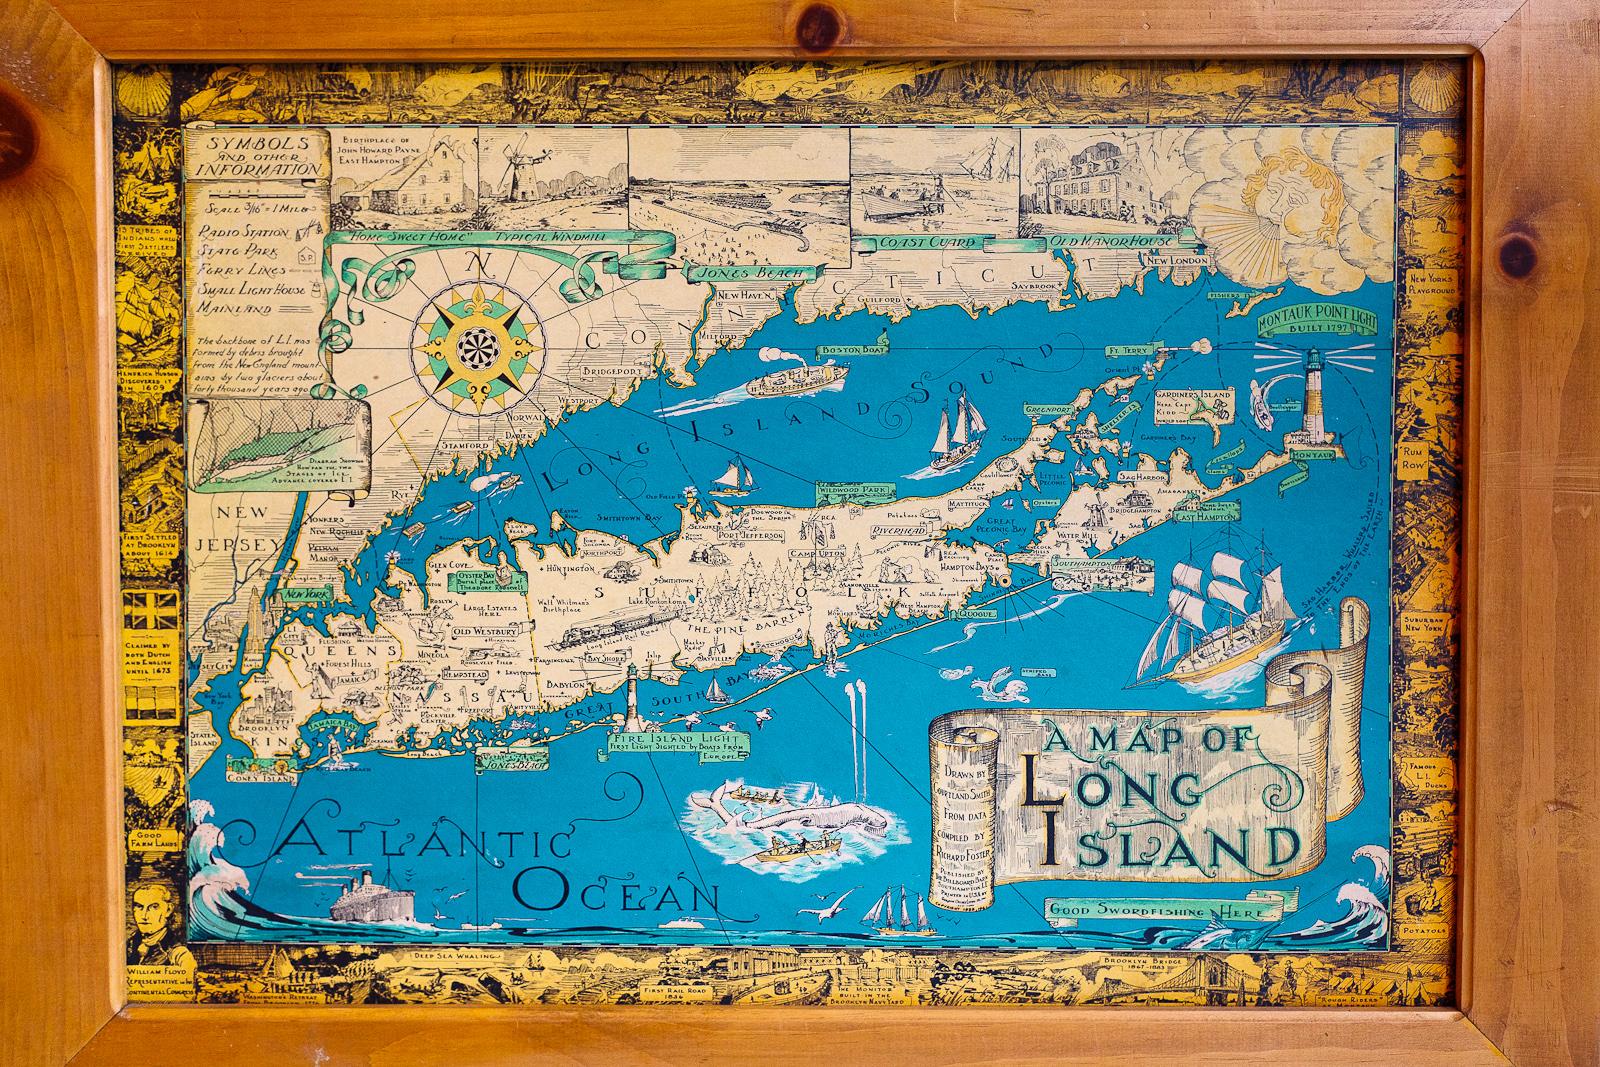 Fisherman's map of Long Island